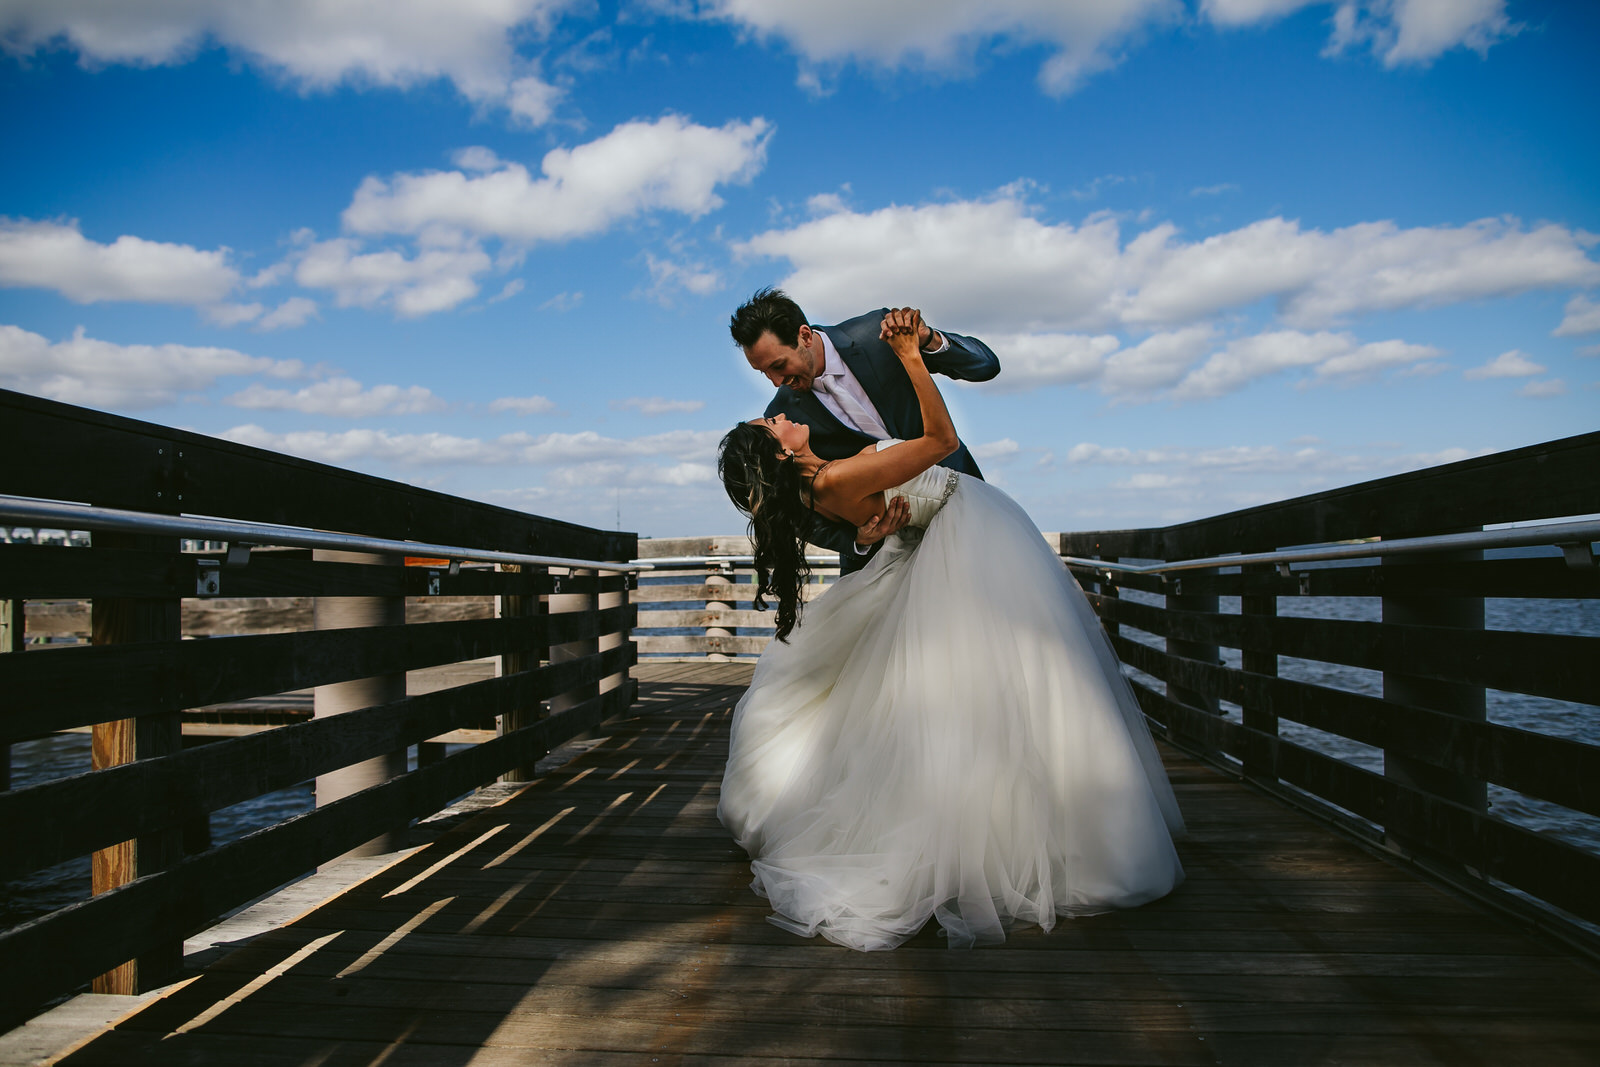 bride_and_groom_jensen_beach_wedding_day-59.jpg